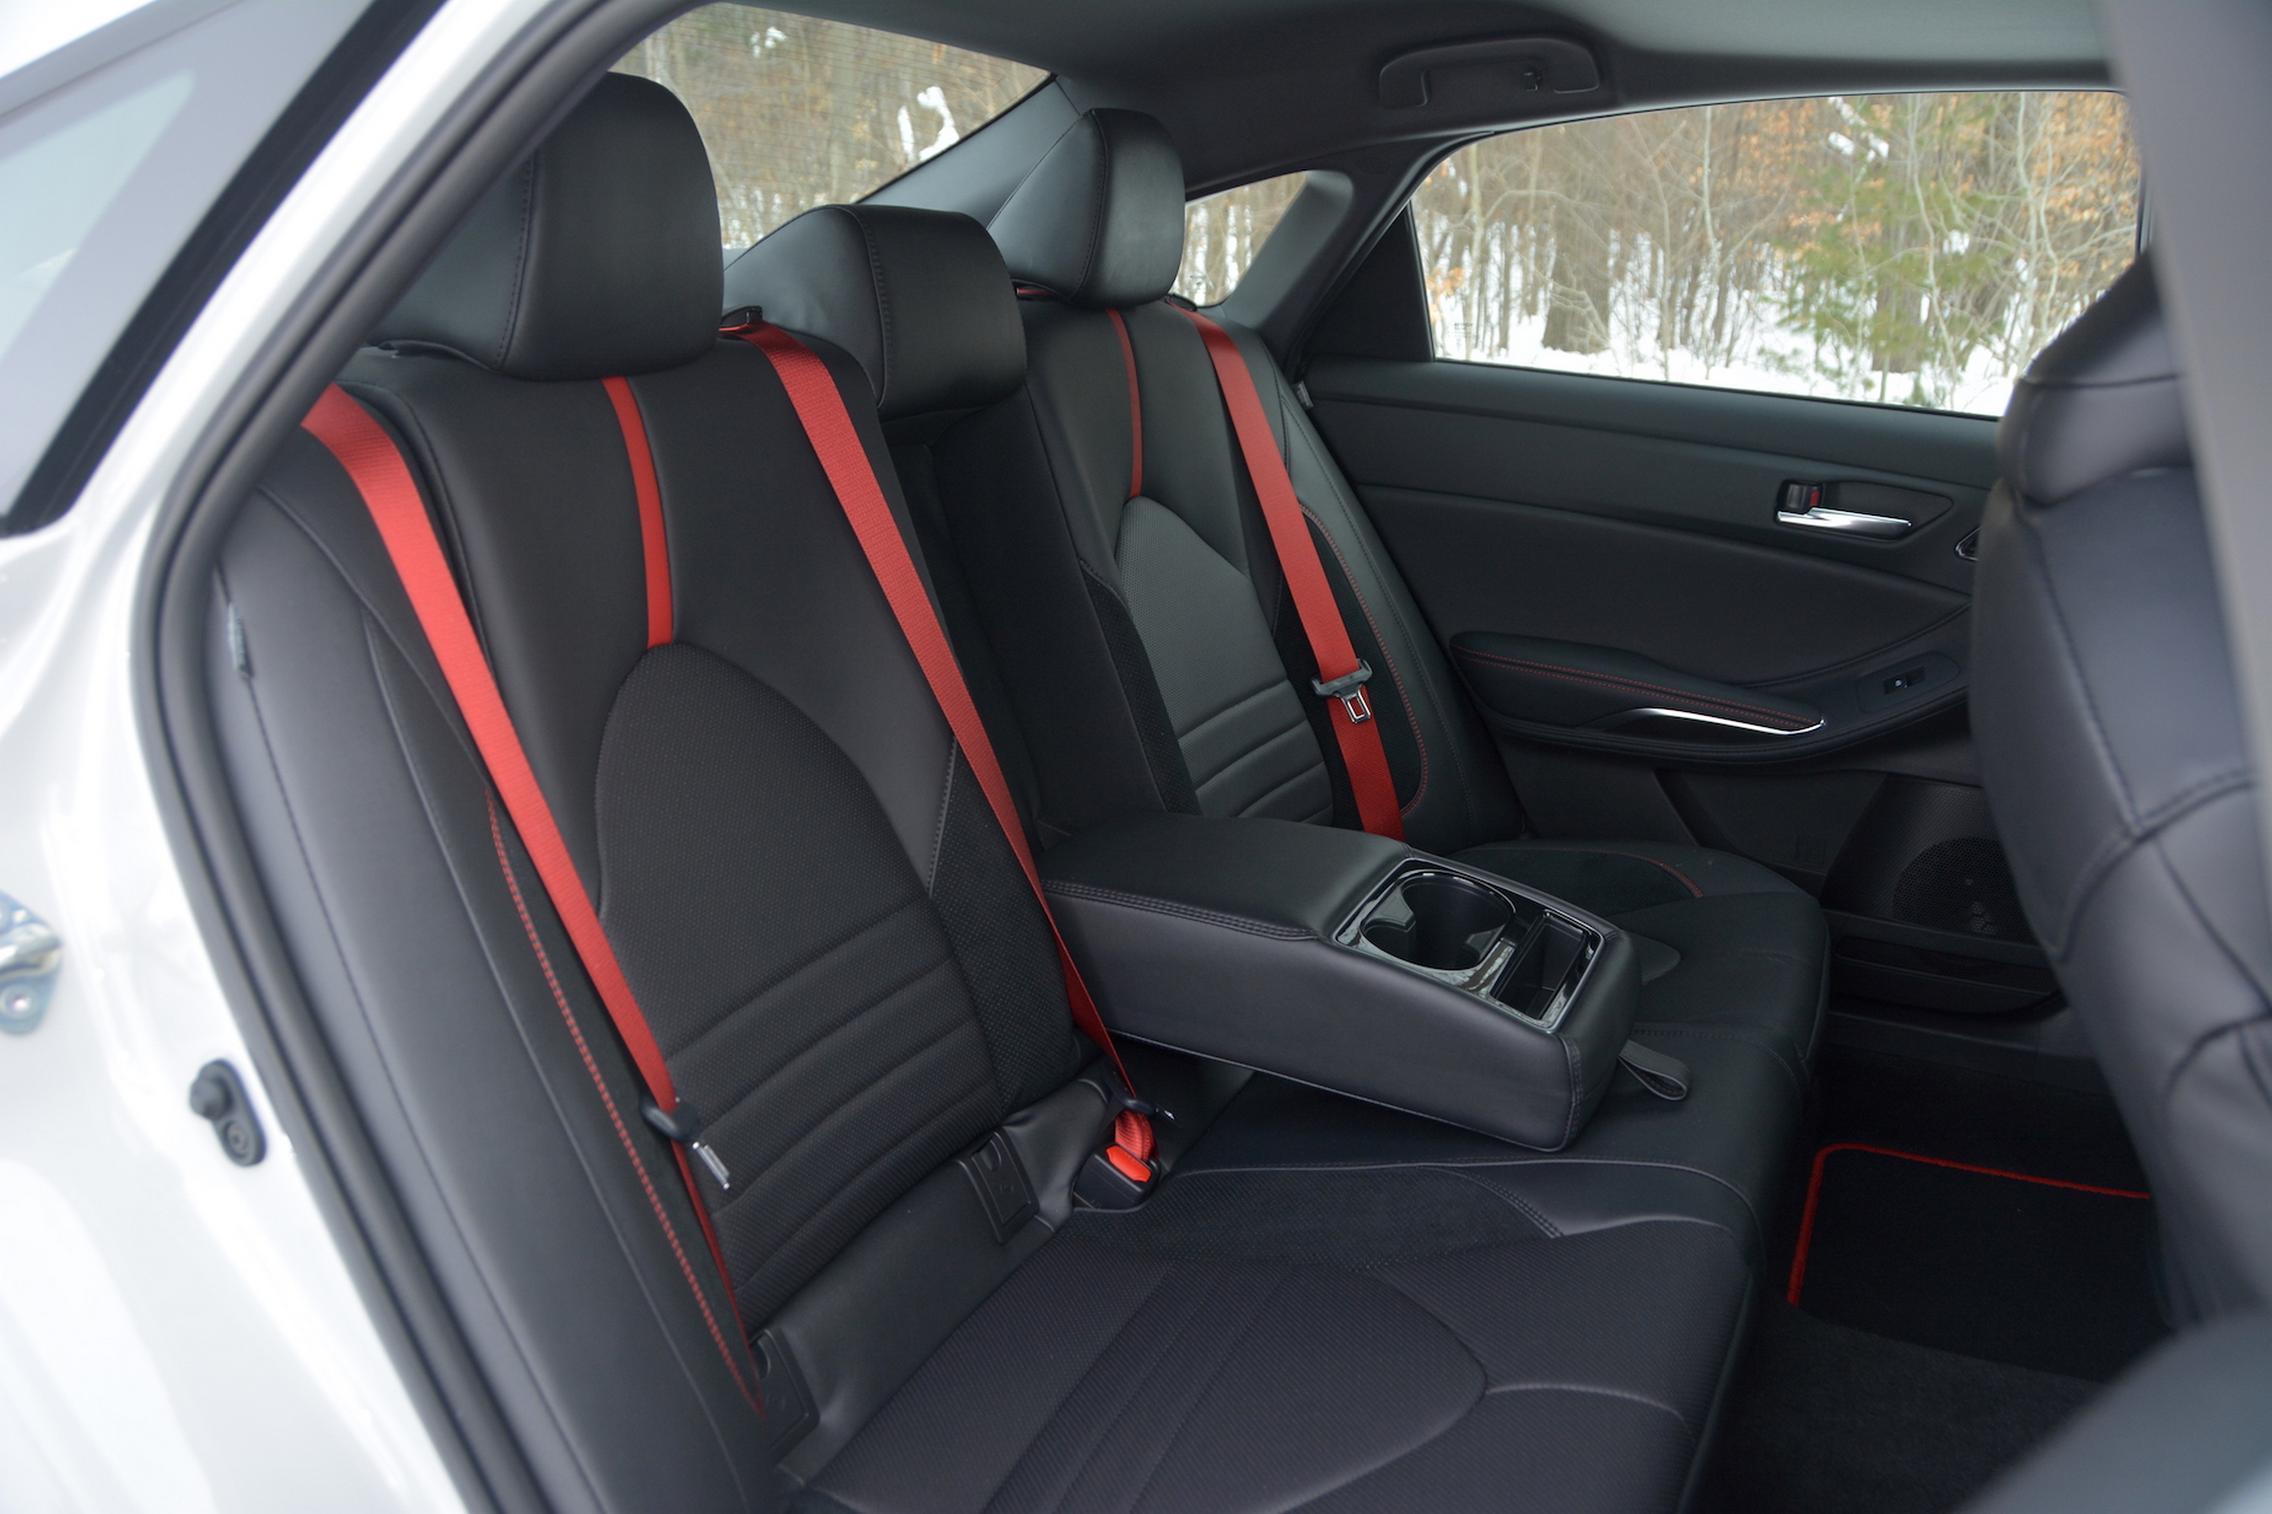 Toyota Avalon TRD seats